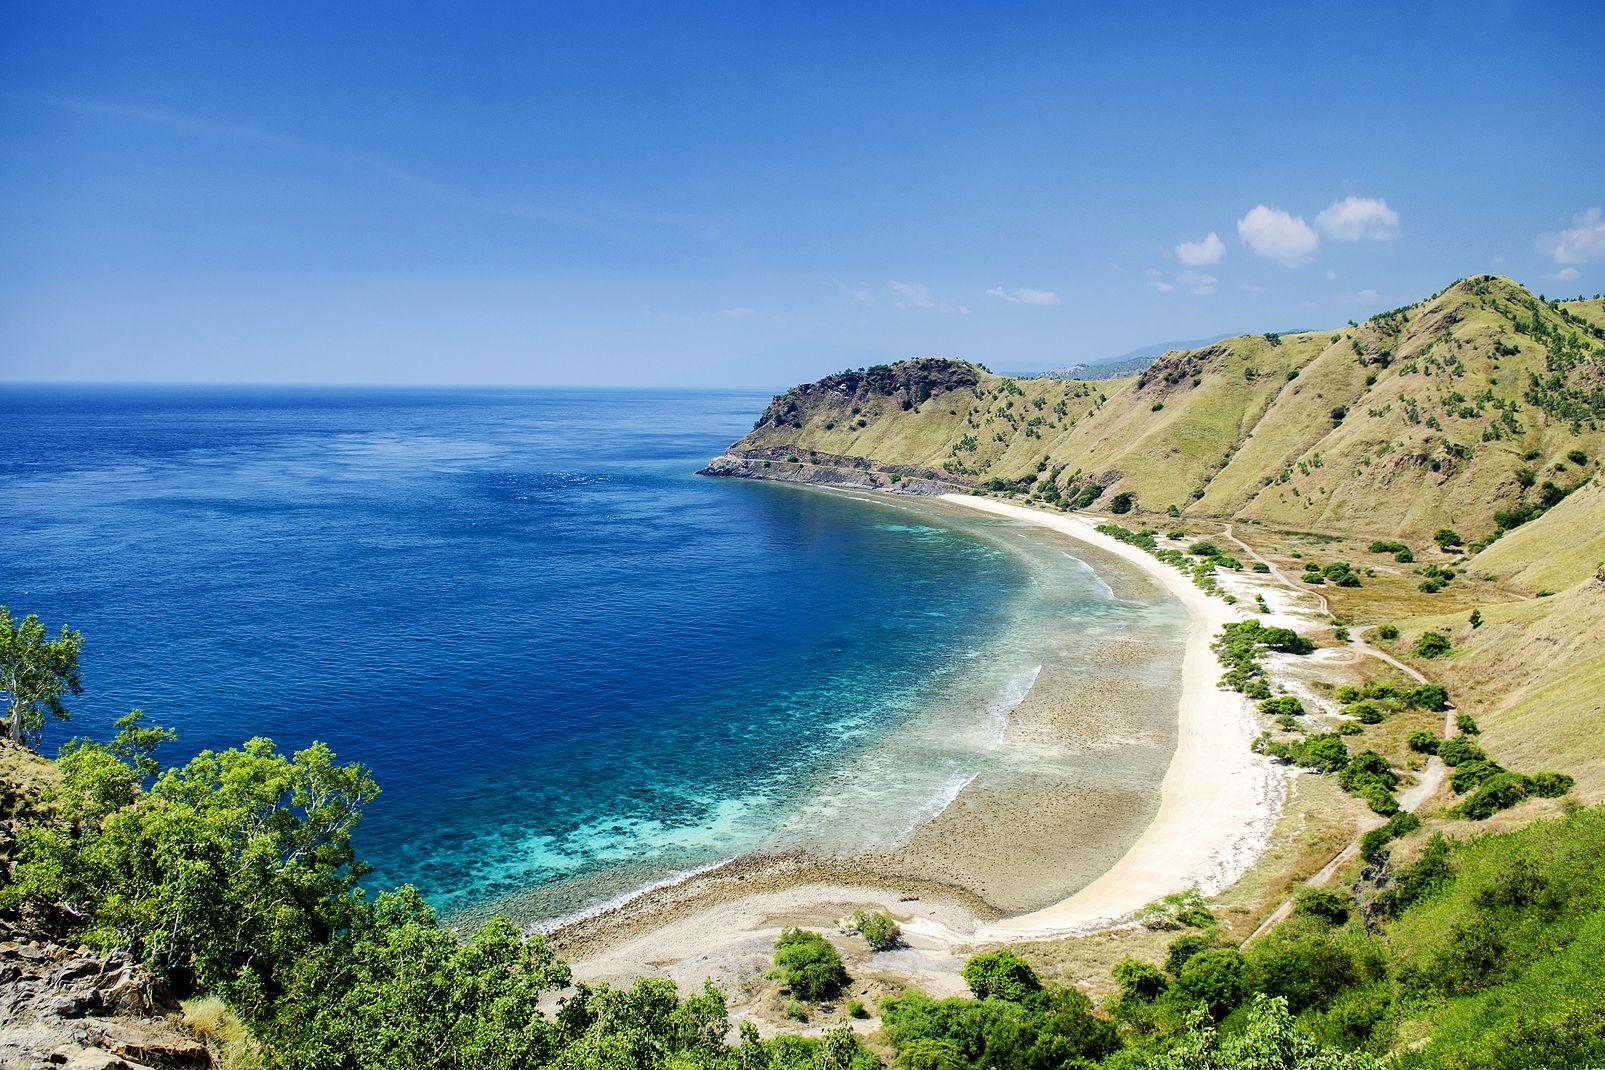 Le Timor, Indonesia